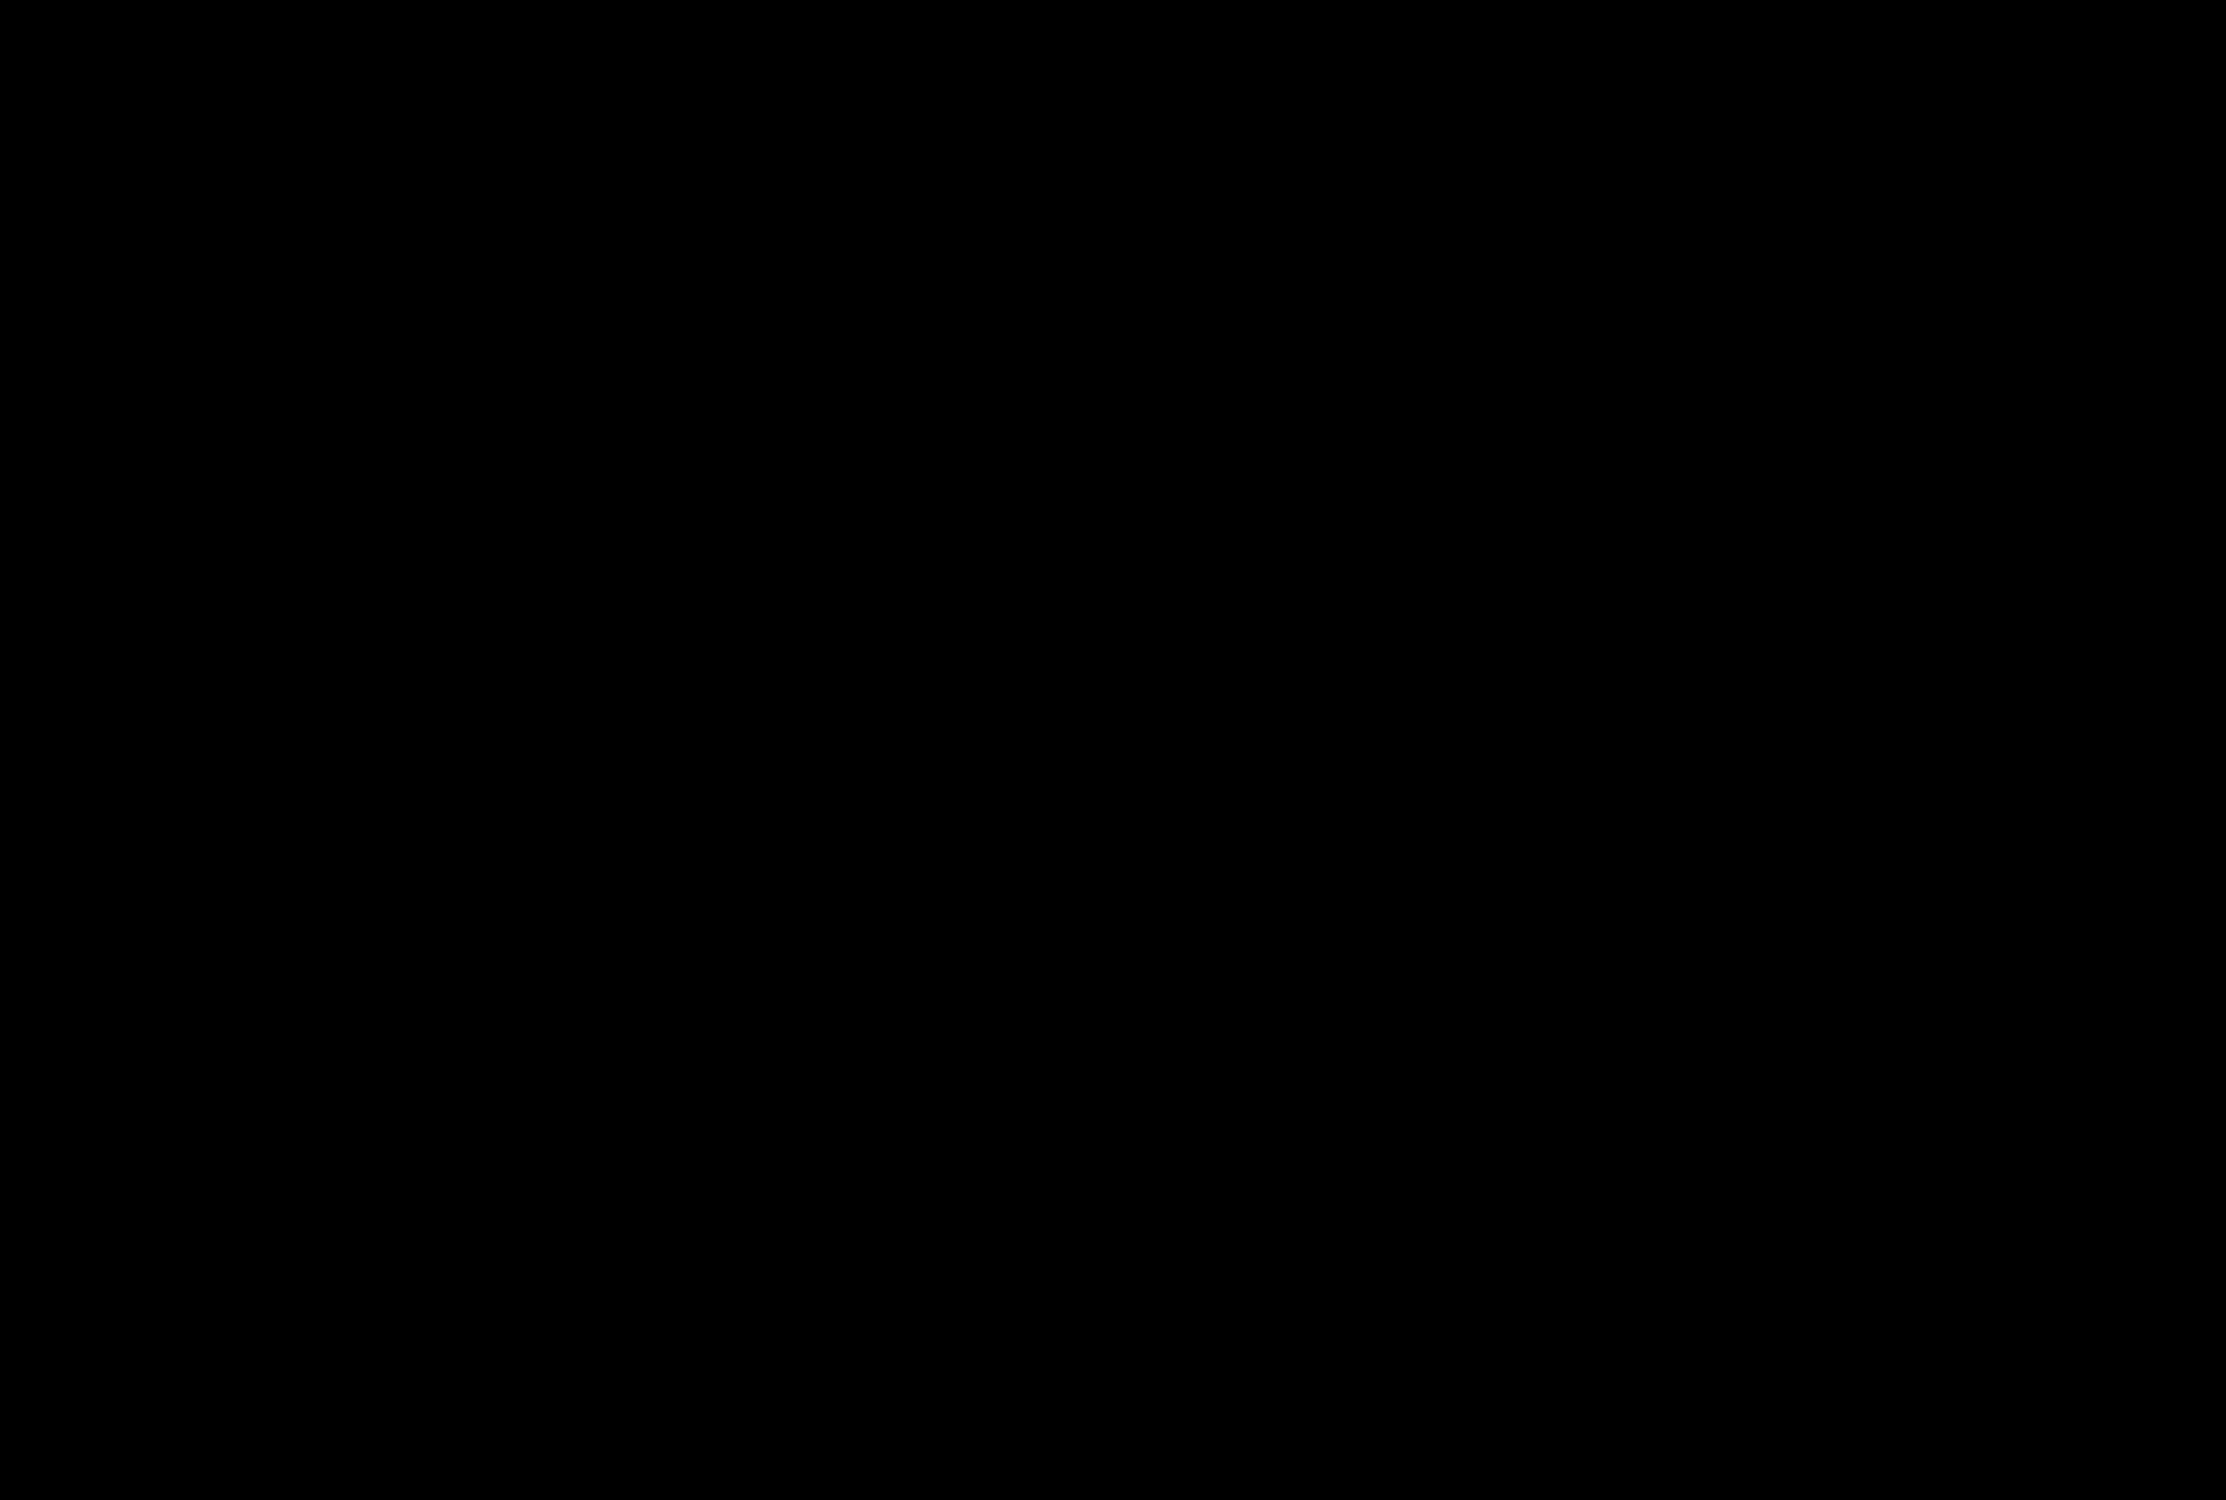 Field Hockey Silhouette Vector Stock Vector - Illustration of hitting,  ball: 102989675